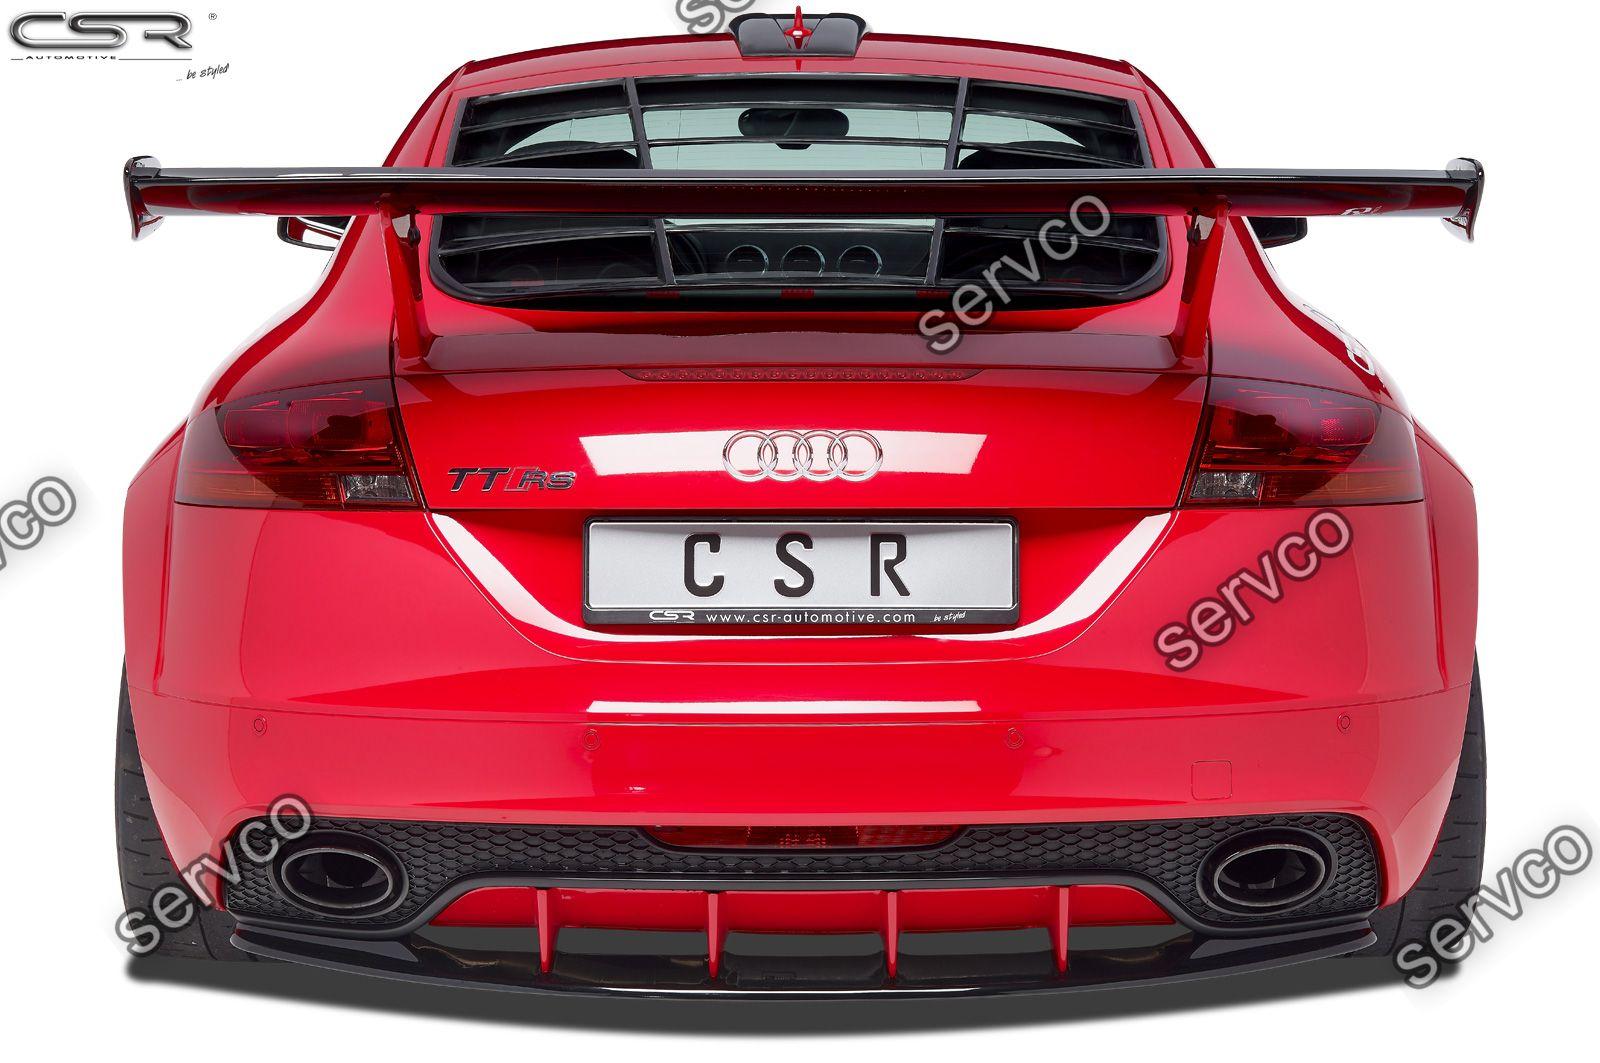 Prelungire difuzor tuning sport bara spate Audi TT RS 8J CSR HA198 2009-2015 v5